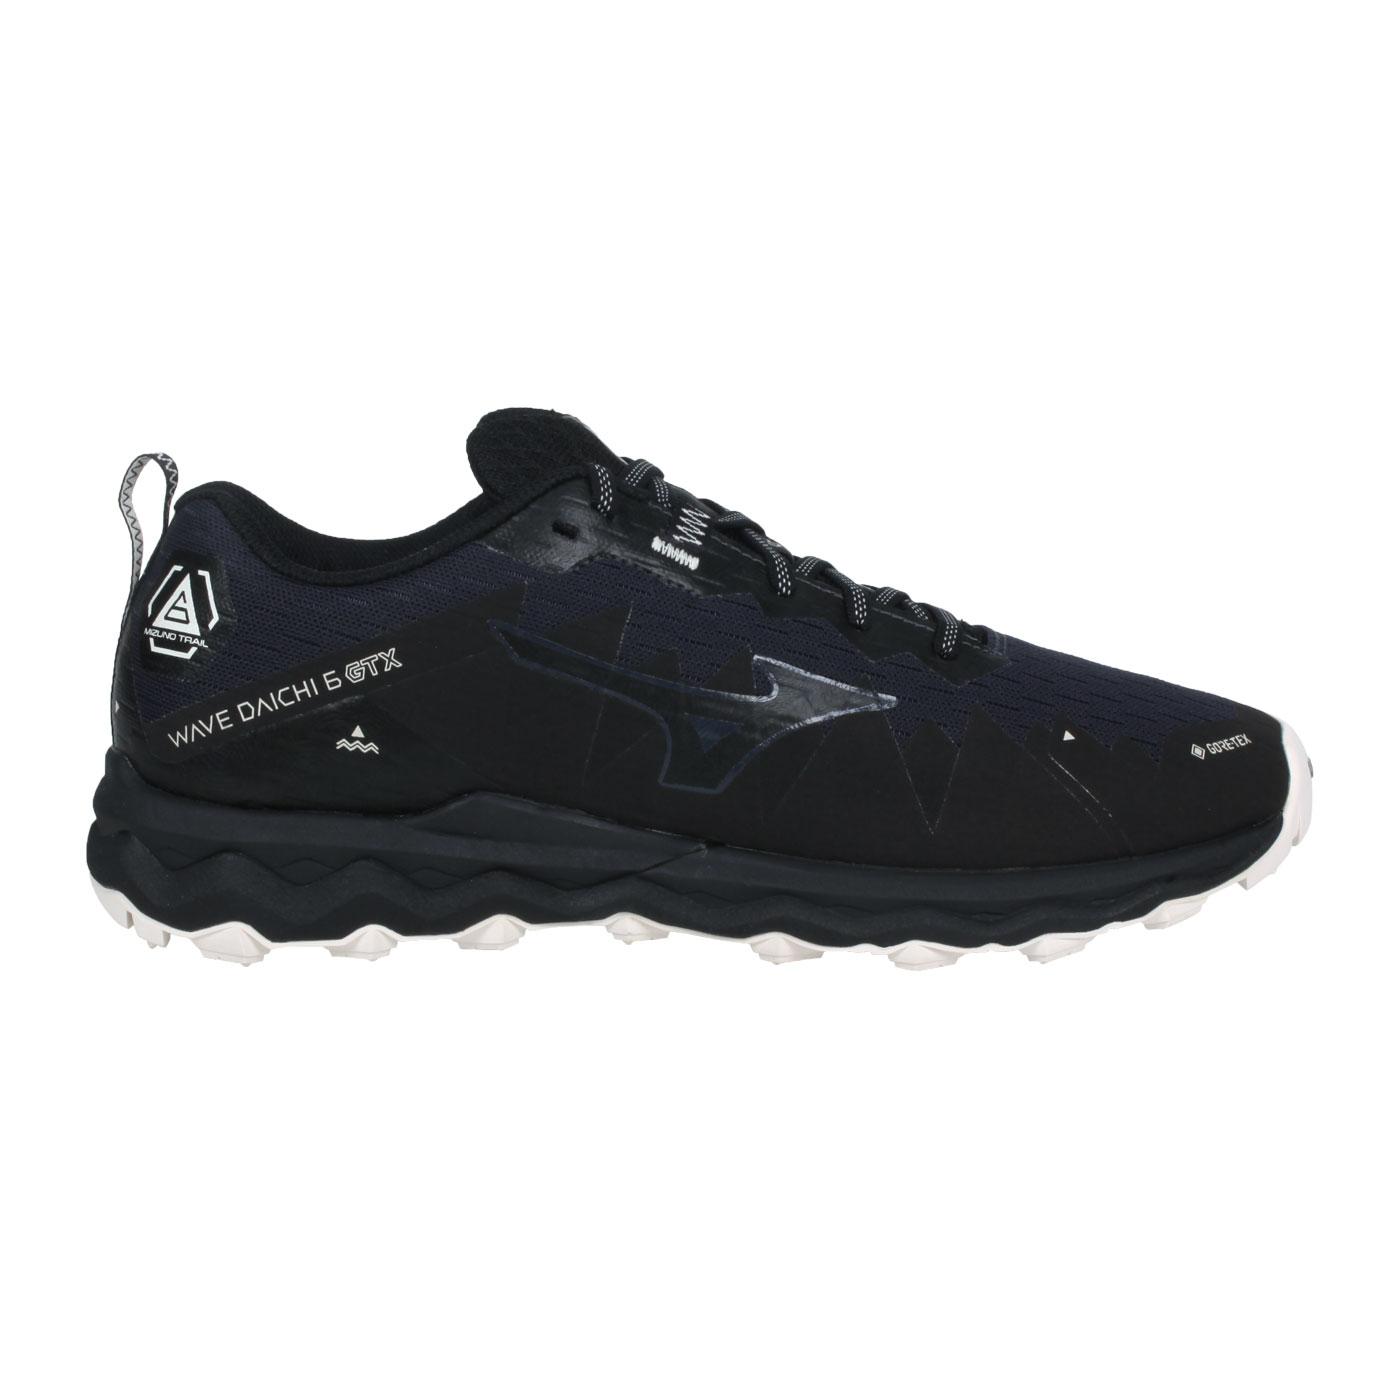 MIZUNO 男款慢跑鞋  @WAVE DAICHI 6 GTX@J1GJ215642 - 黑丈青